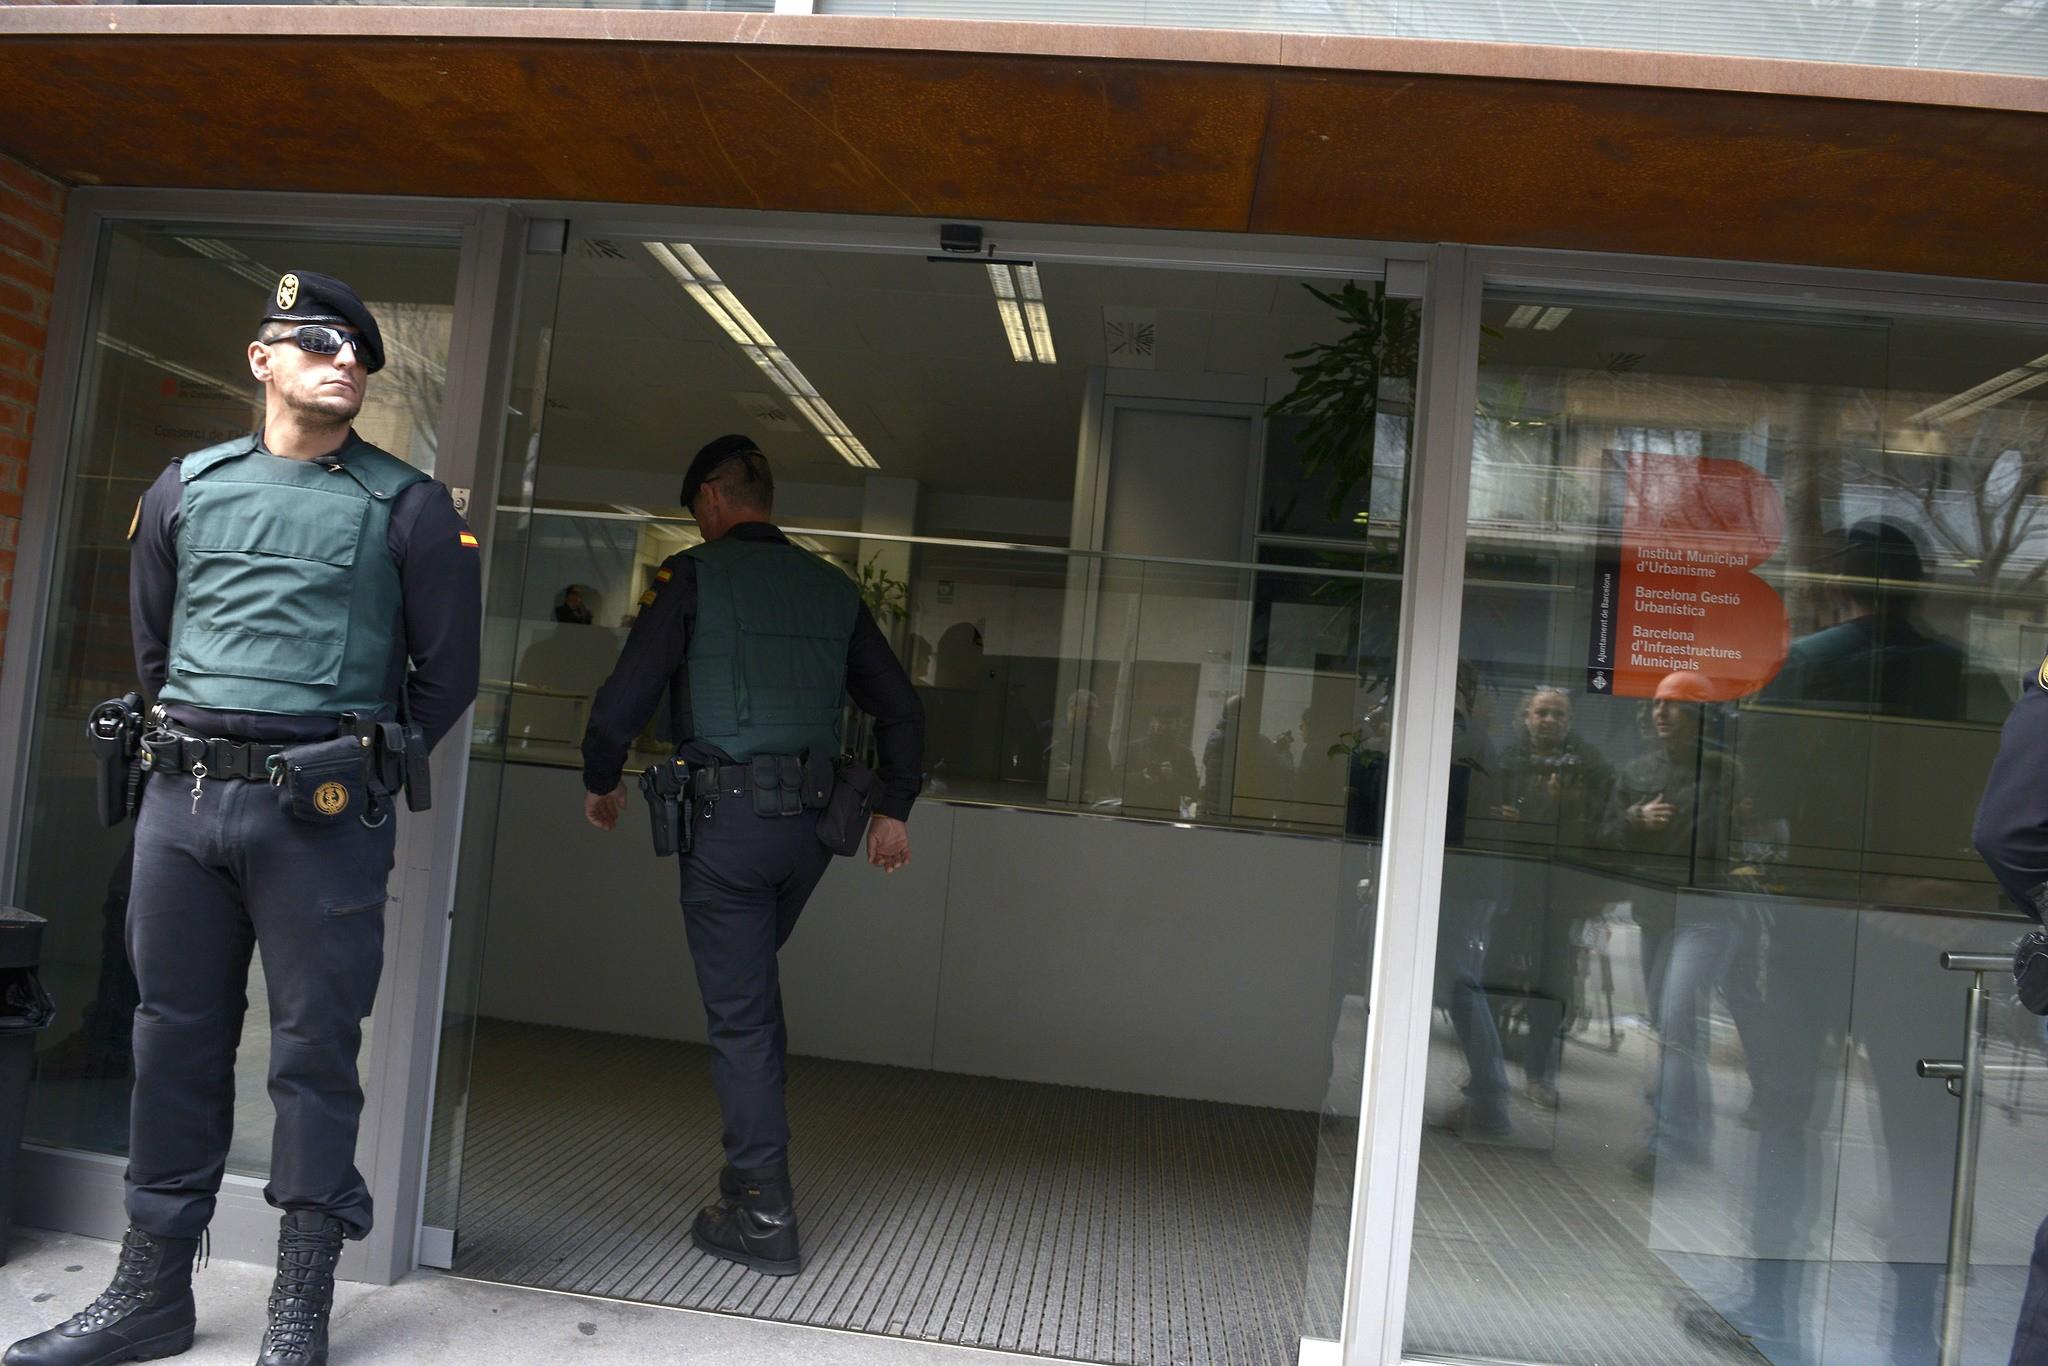 Guardias civiles en el registro de la empresa municipal Bimsa en febrero de 2017 SANTI COGOLLUDO